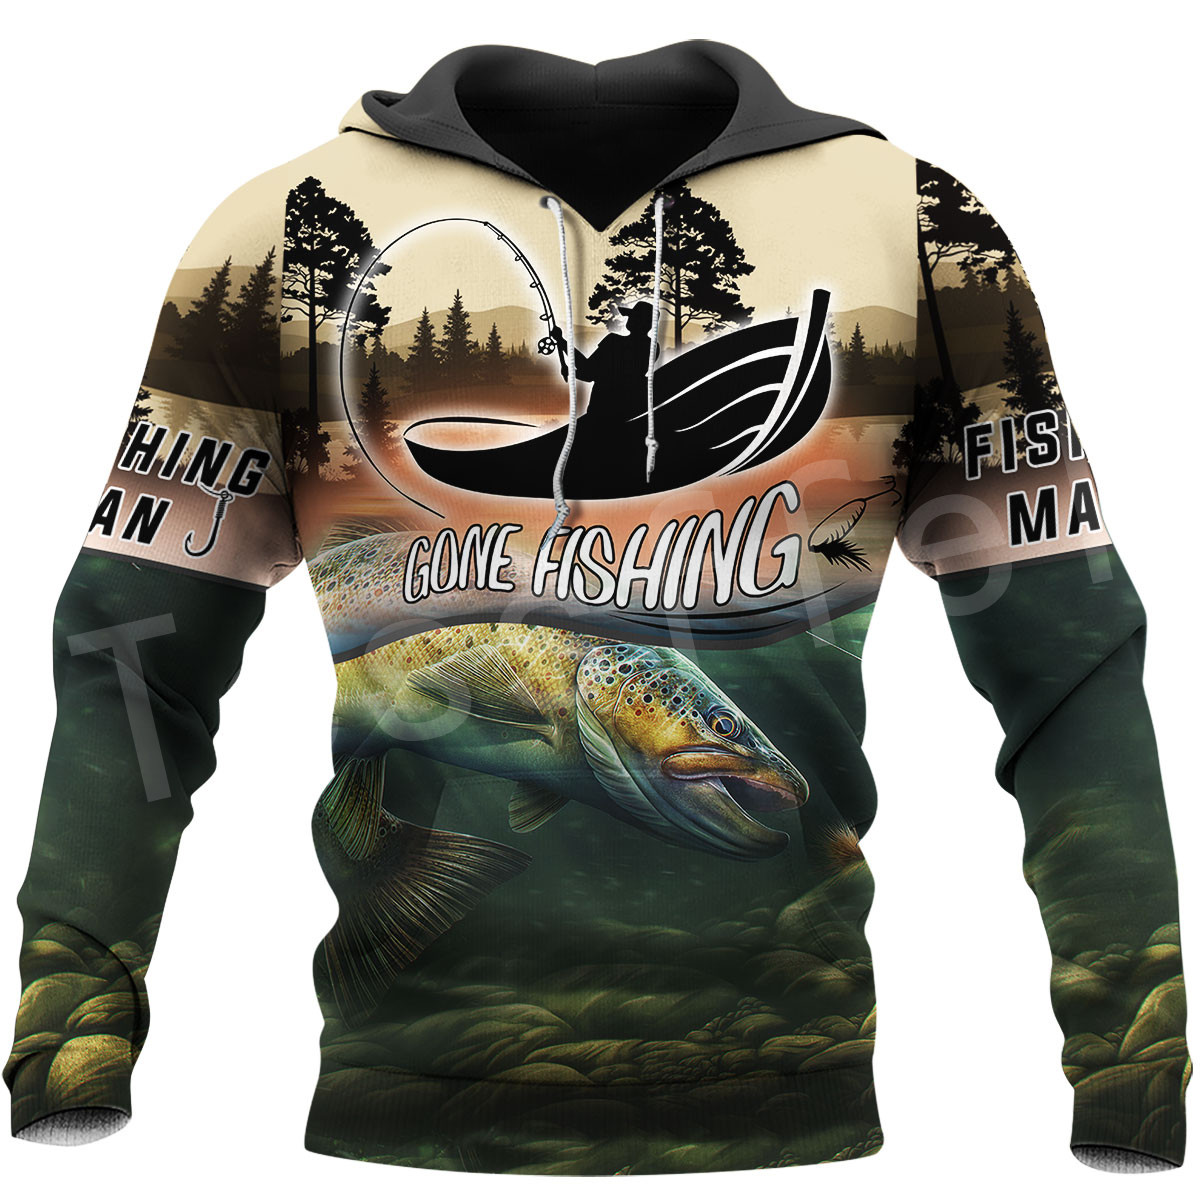 Tessffel NewFashion Animal Marlin Hunting Fishing Harajuku Casual Pullover 3DPrint Zipper/Hoodie/Sweatshirt/Jacket/Men/Women S13